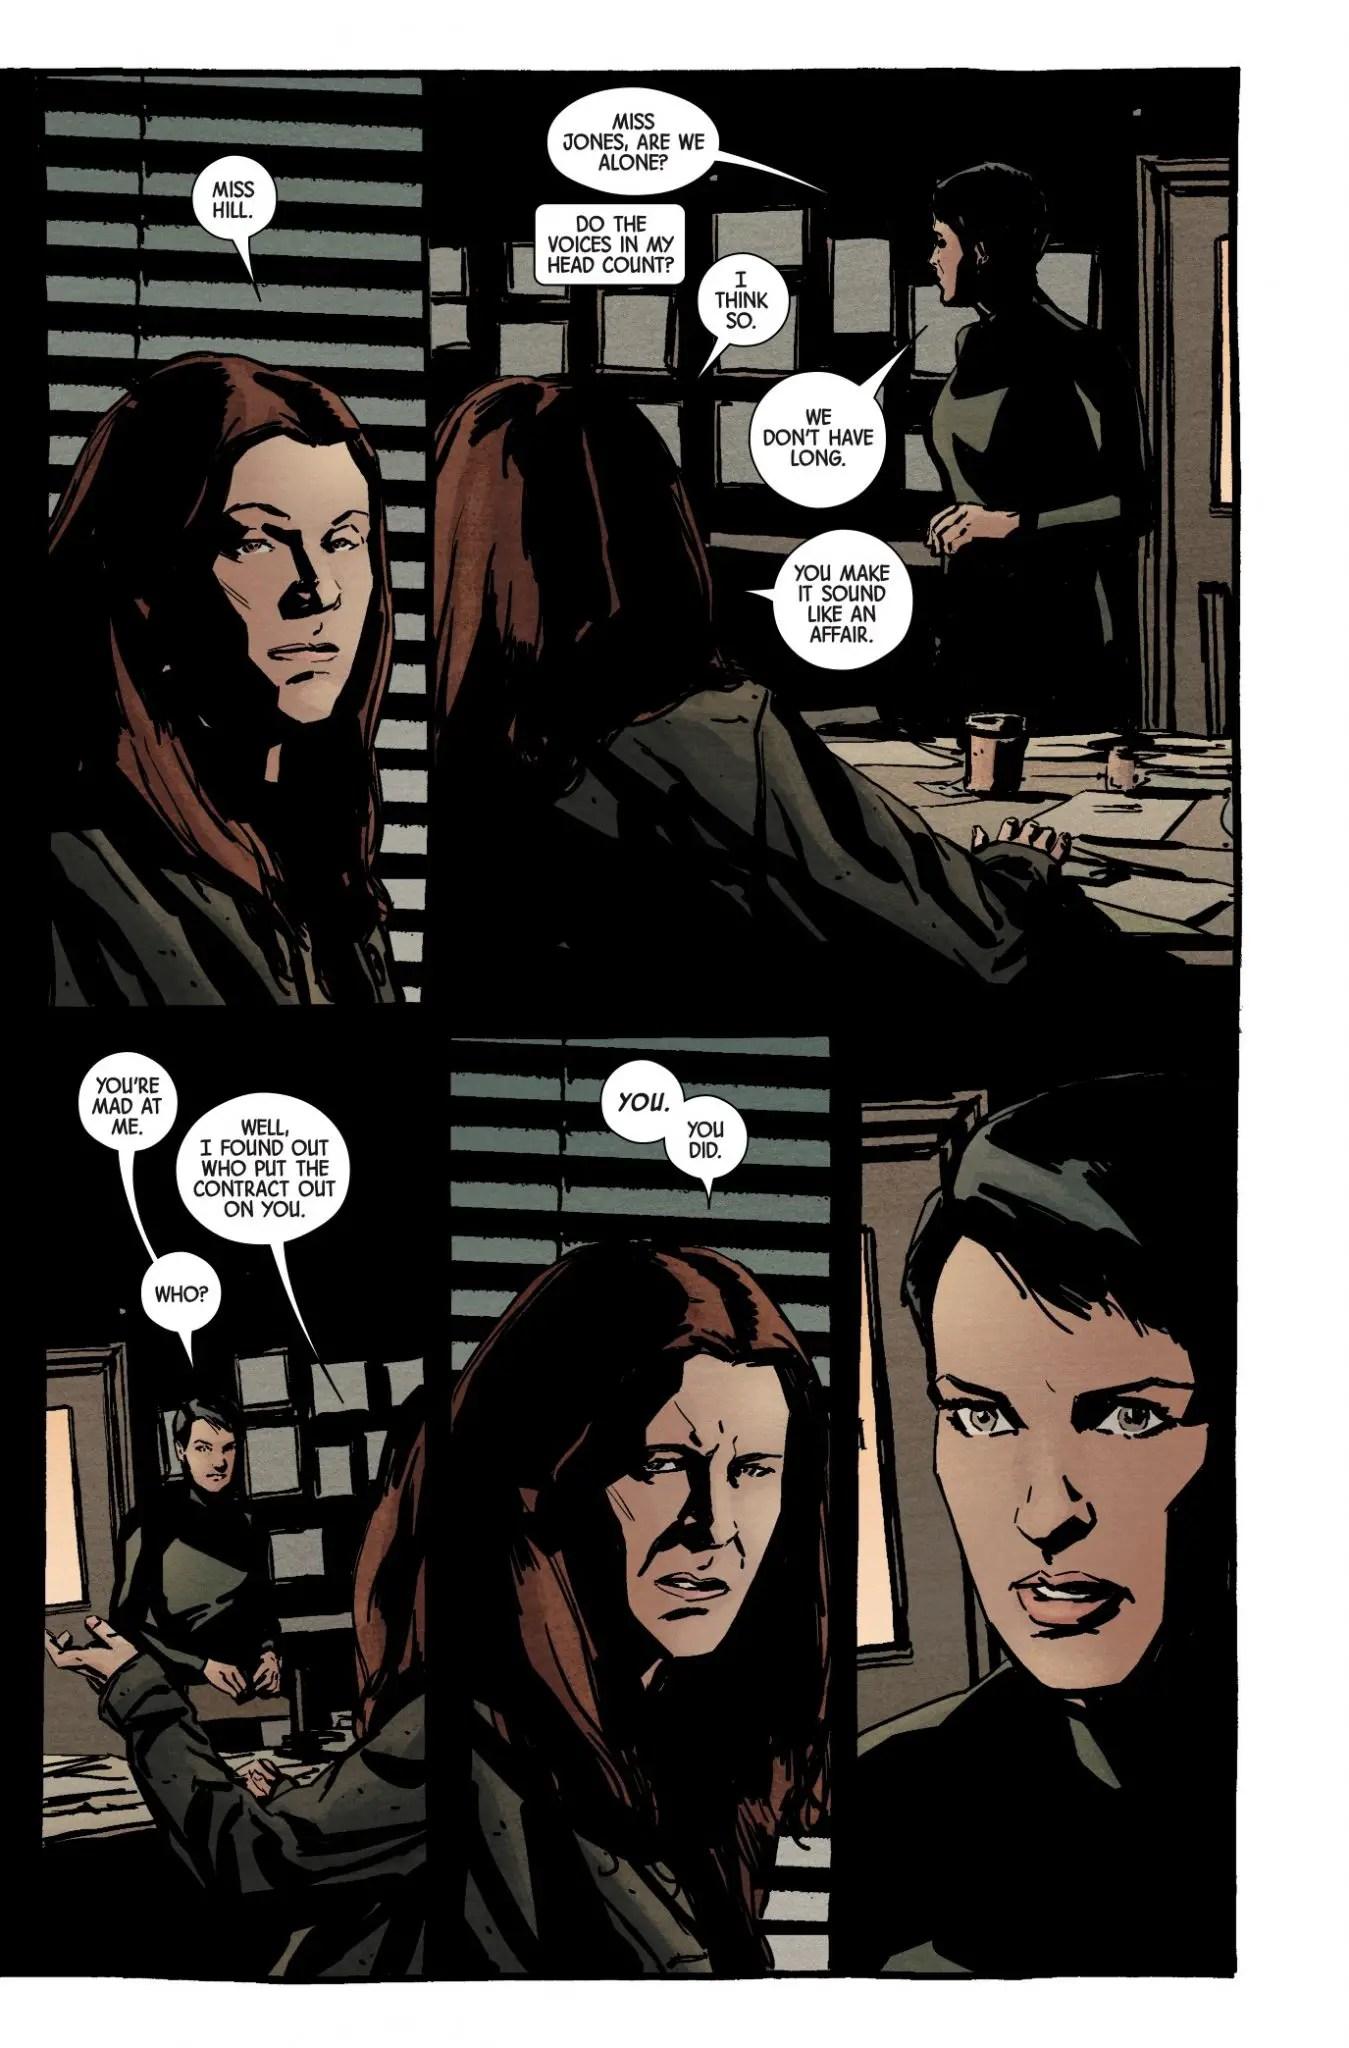 Jessica Jones #10 Review